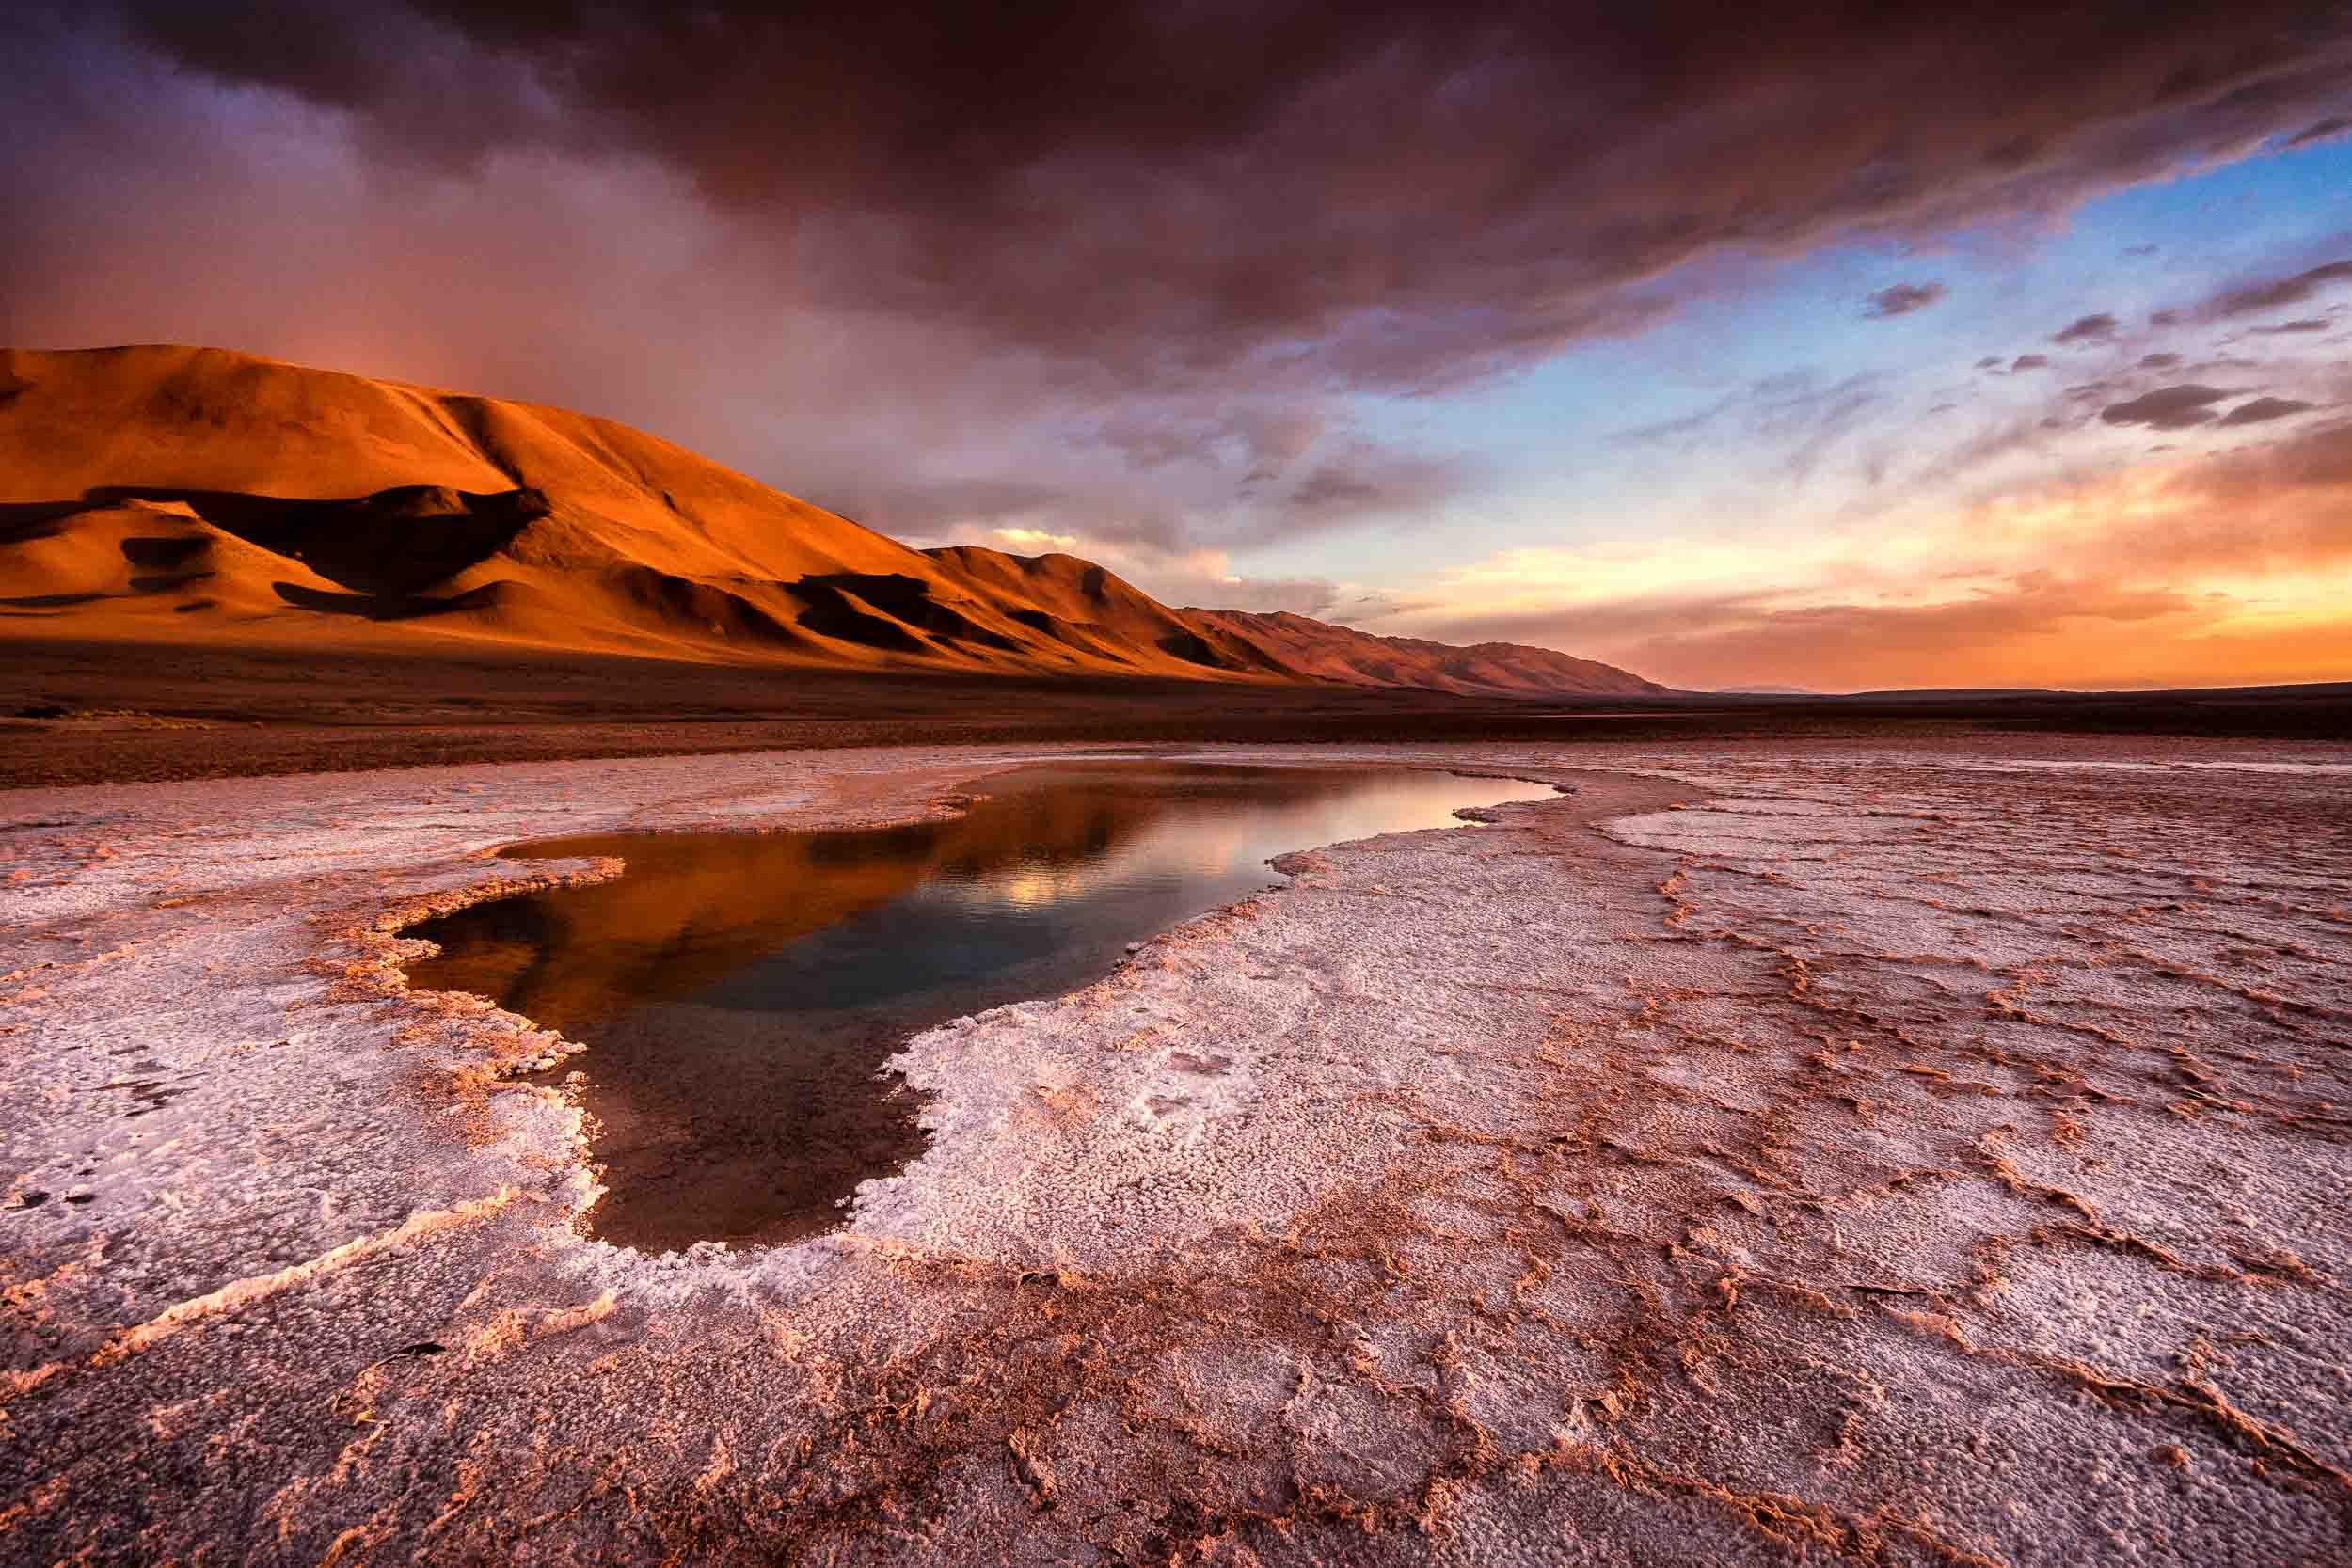 argentine-salta-et-la-vallee-de-lerma-secret-world